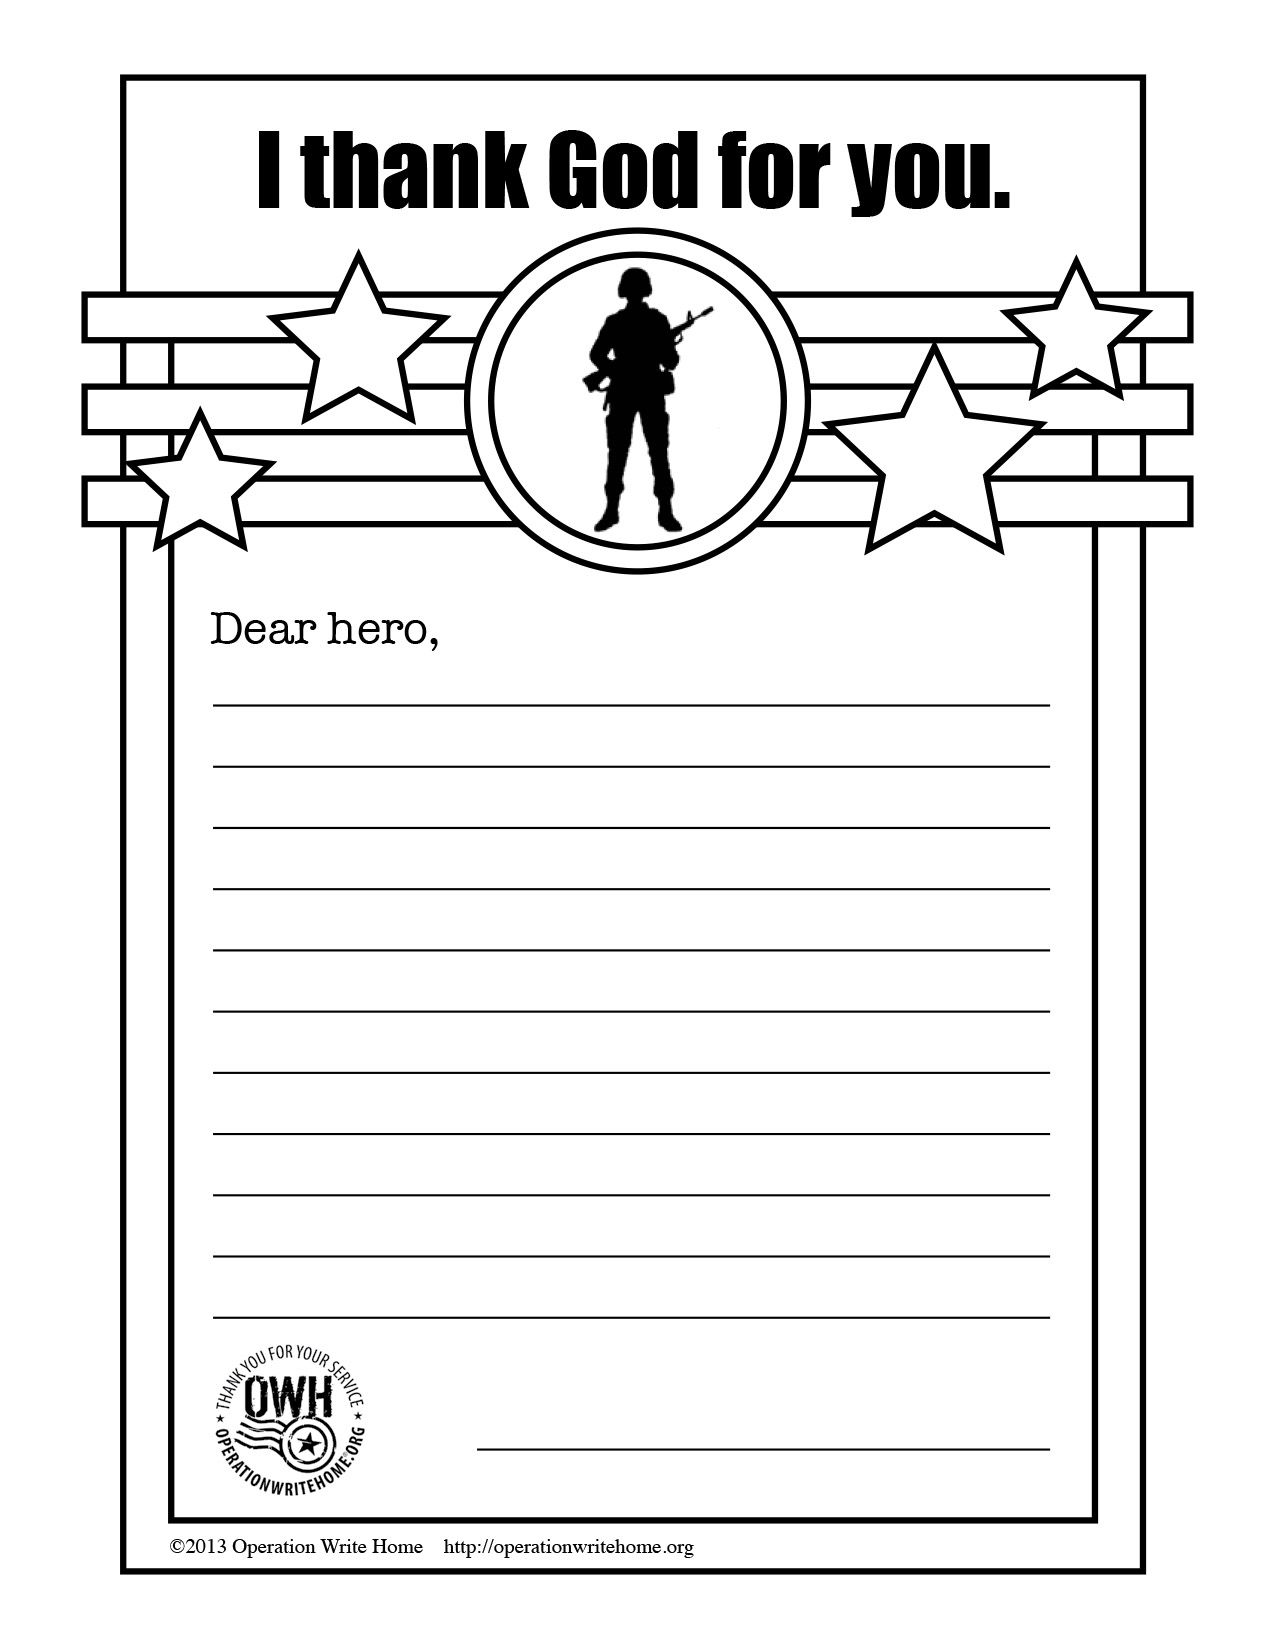 Operation Write Home Thankgodc